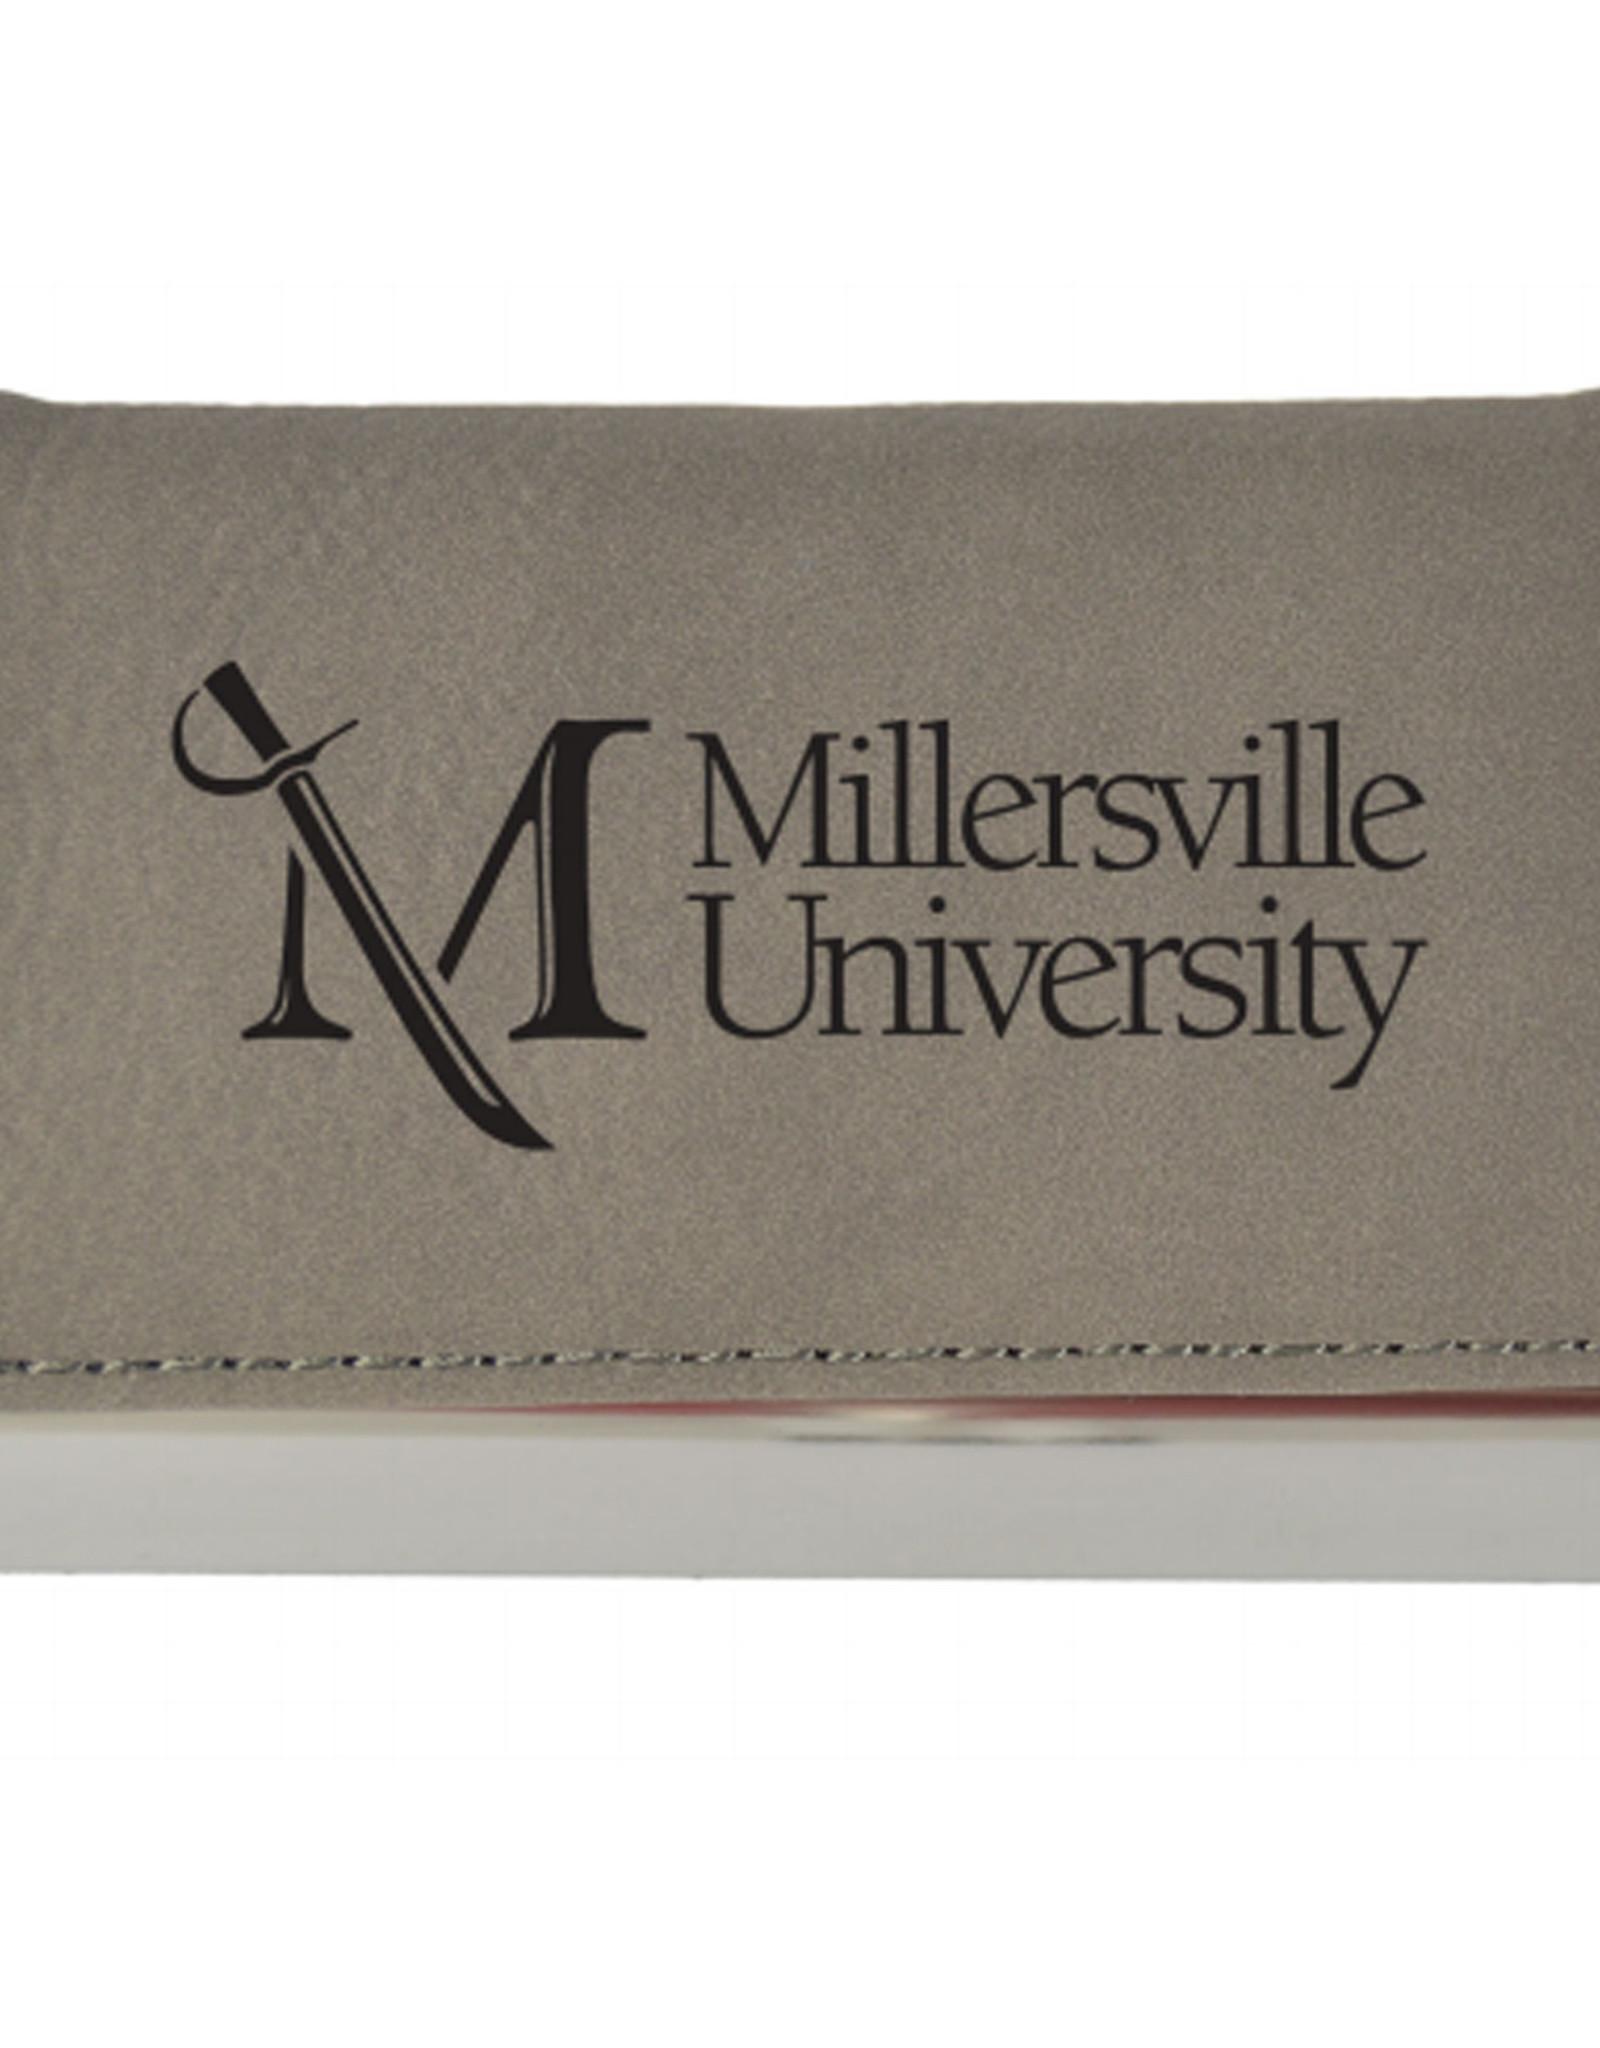 M Sword Leather Engraved Business Card Holder